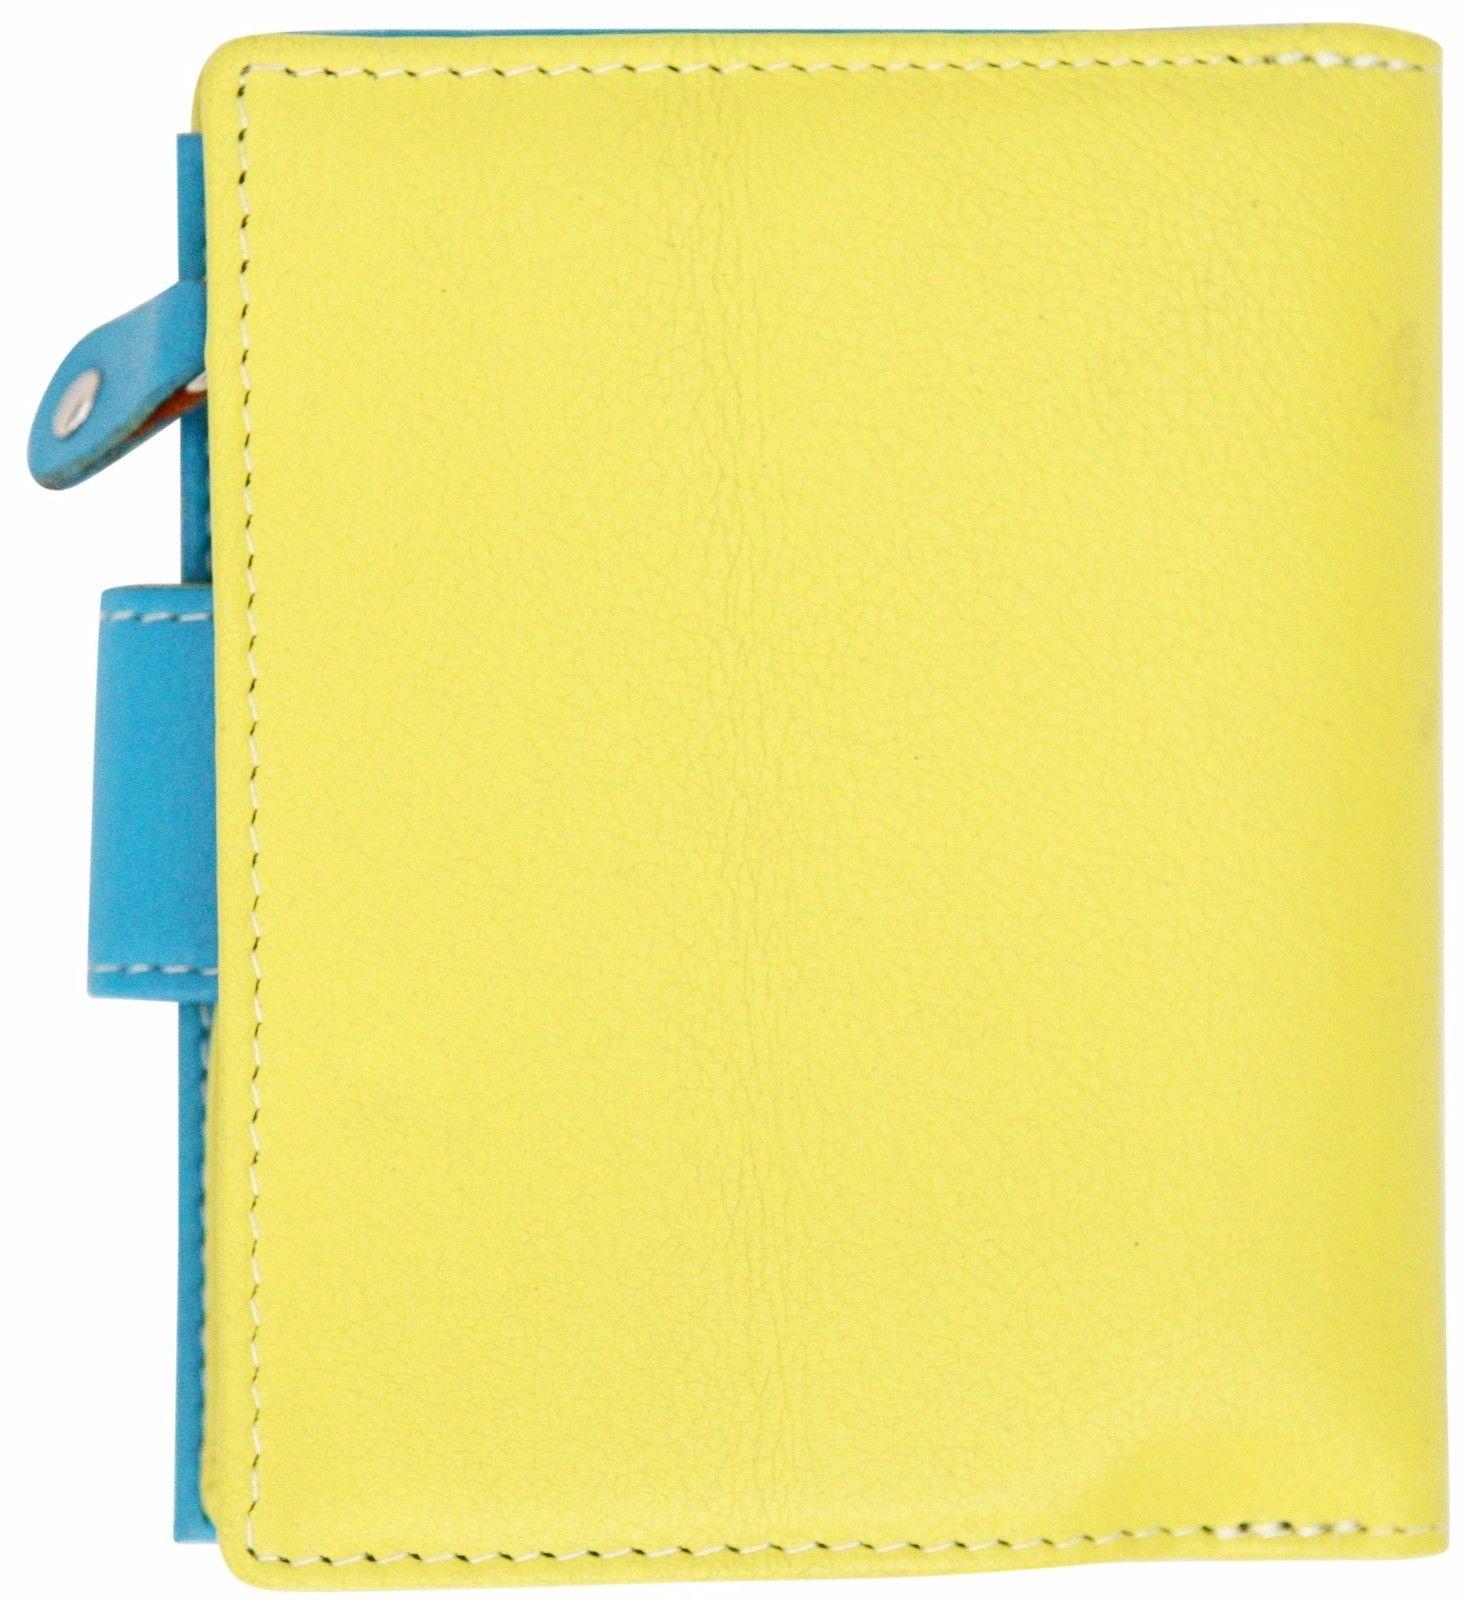 Felda-RFID-onorevoli-MEDAGLIA-amp-Card-Purse-Wallet-Genuine-Leather-Multi-SOFT-BOX-REGALO miniatura 35